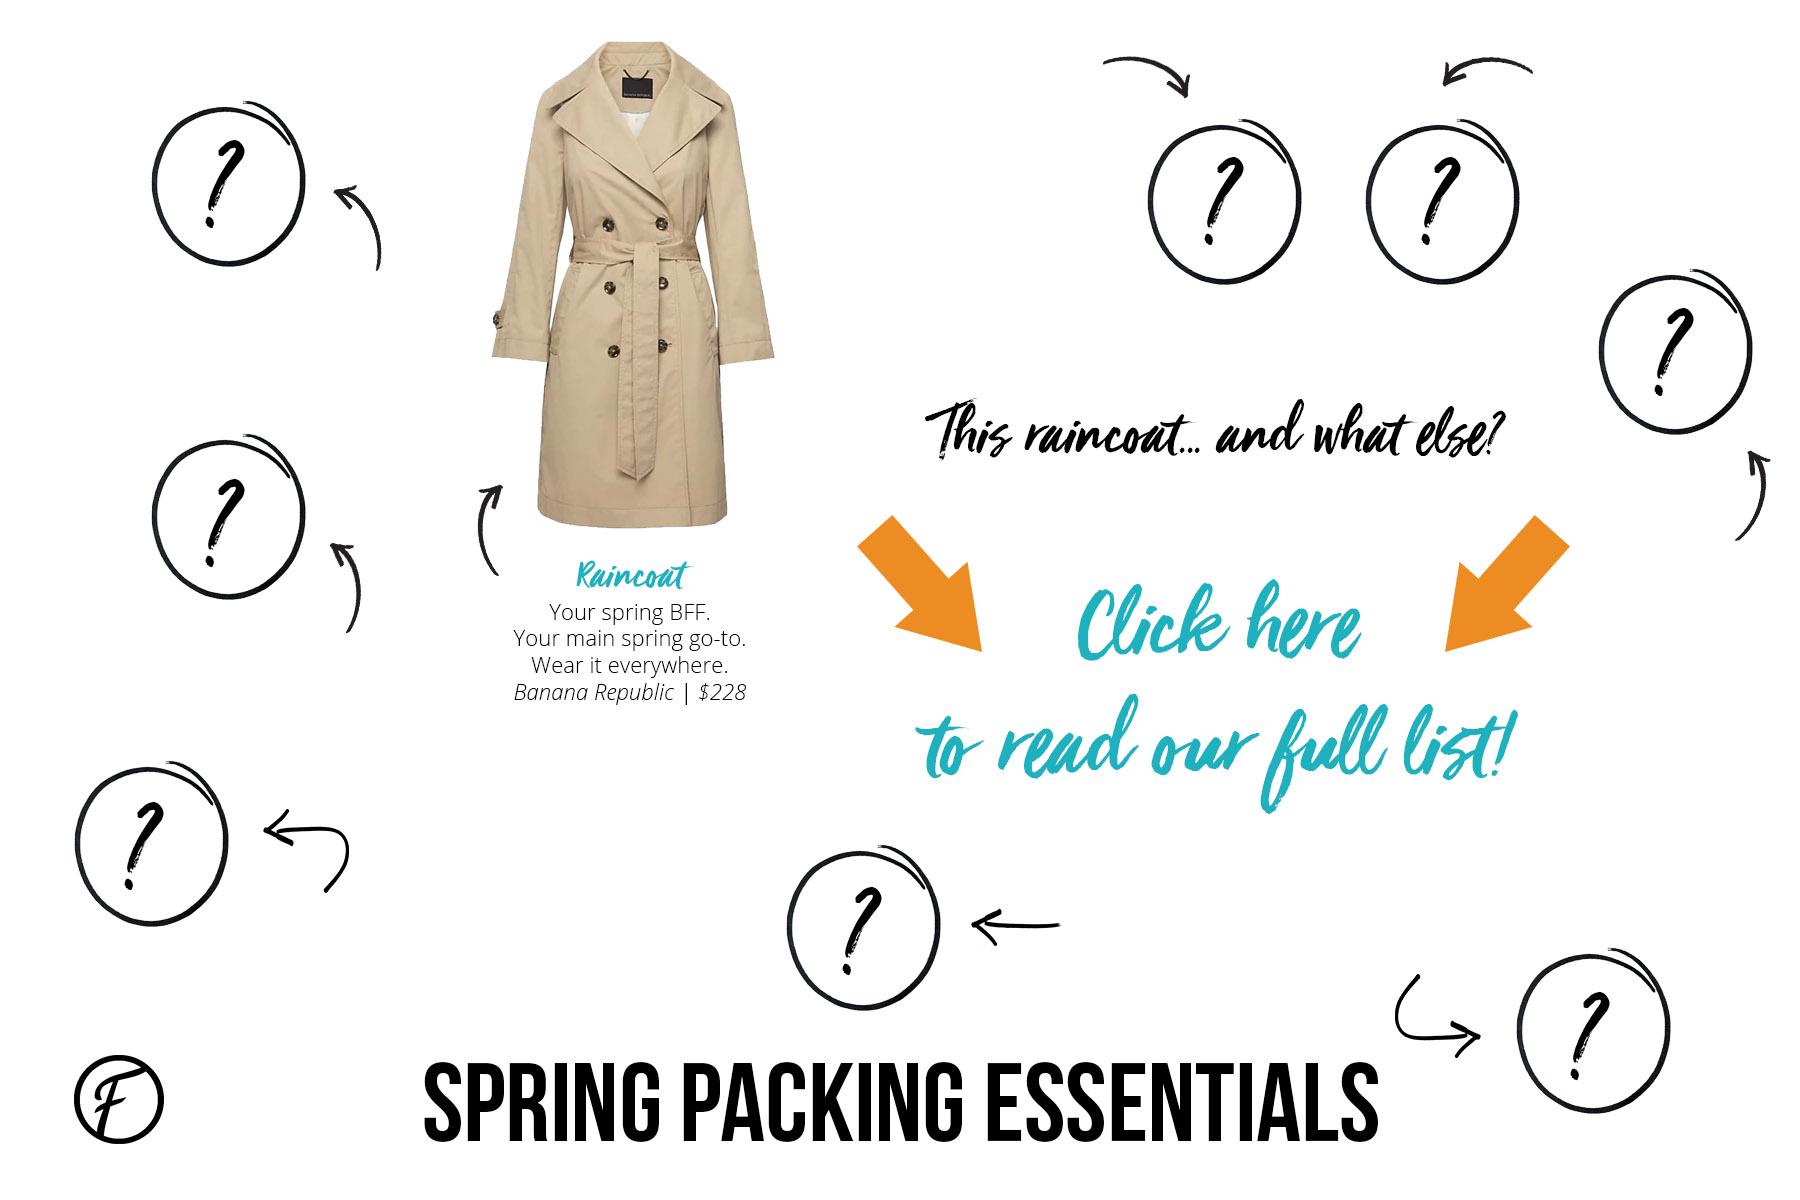 Spring_Packing_Essentials_Teaser